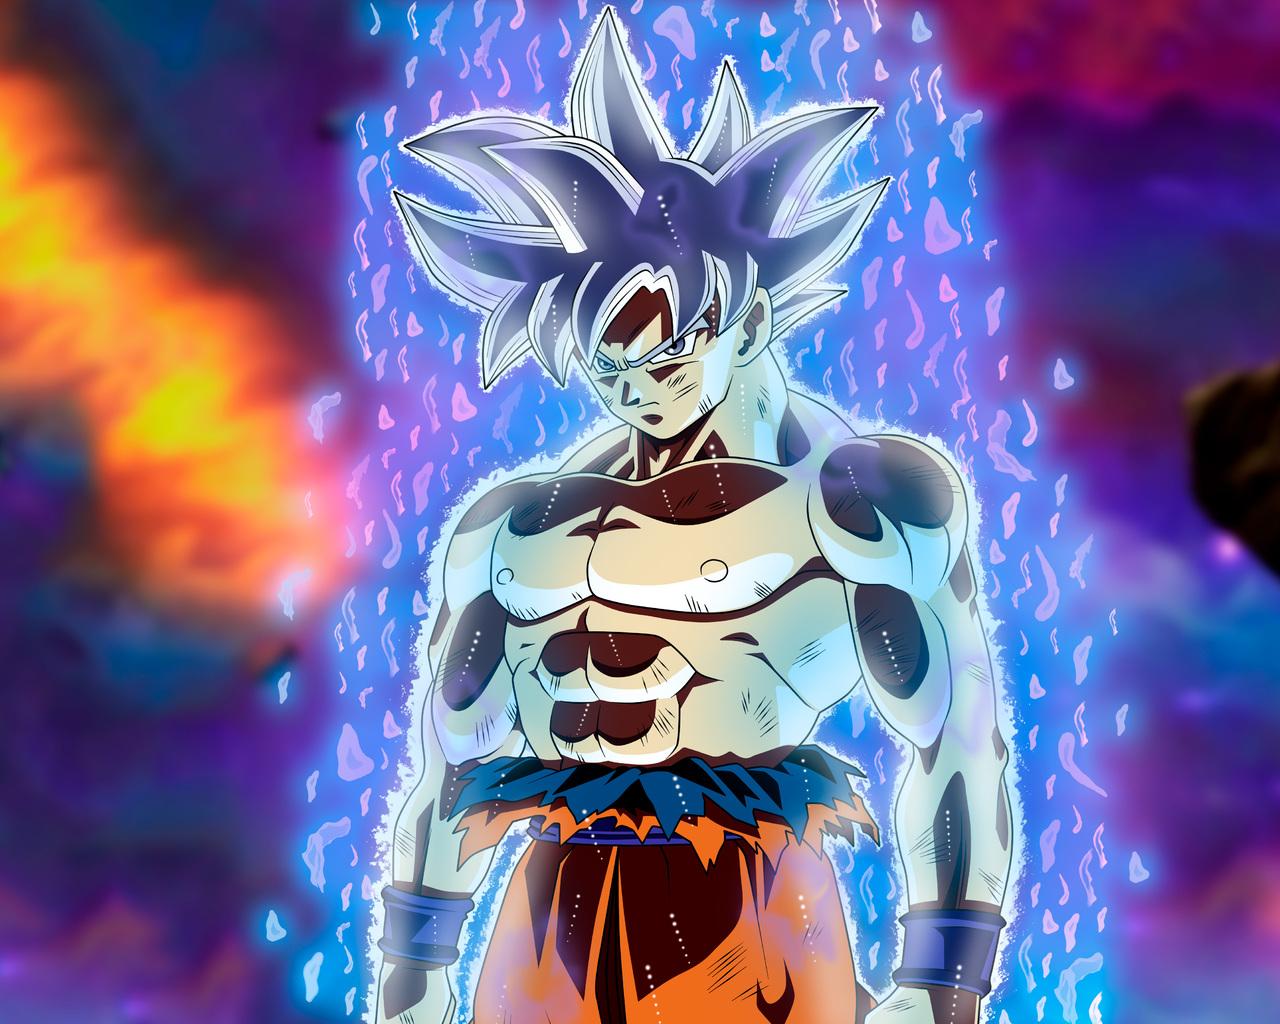 1280x1024 Goku Migatte No Gokui Perfecto Ultra Instinct